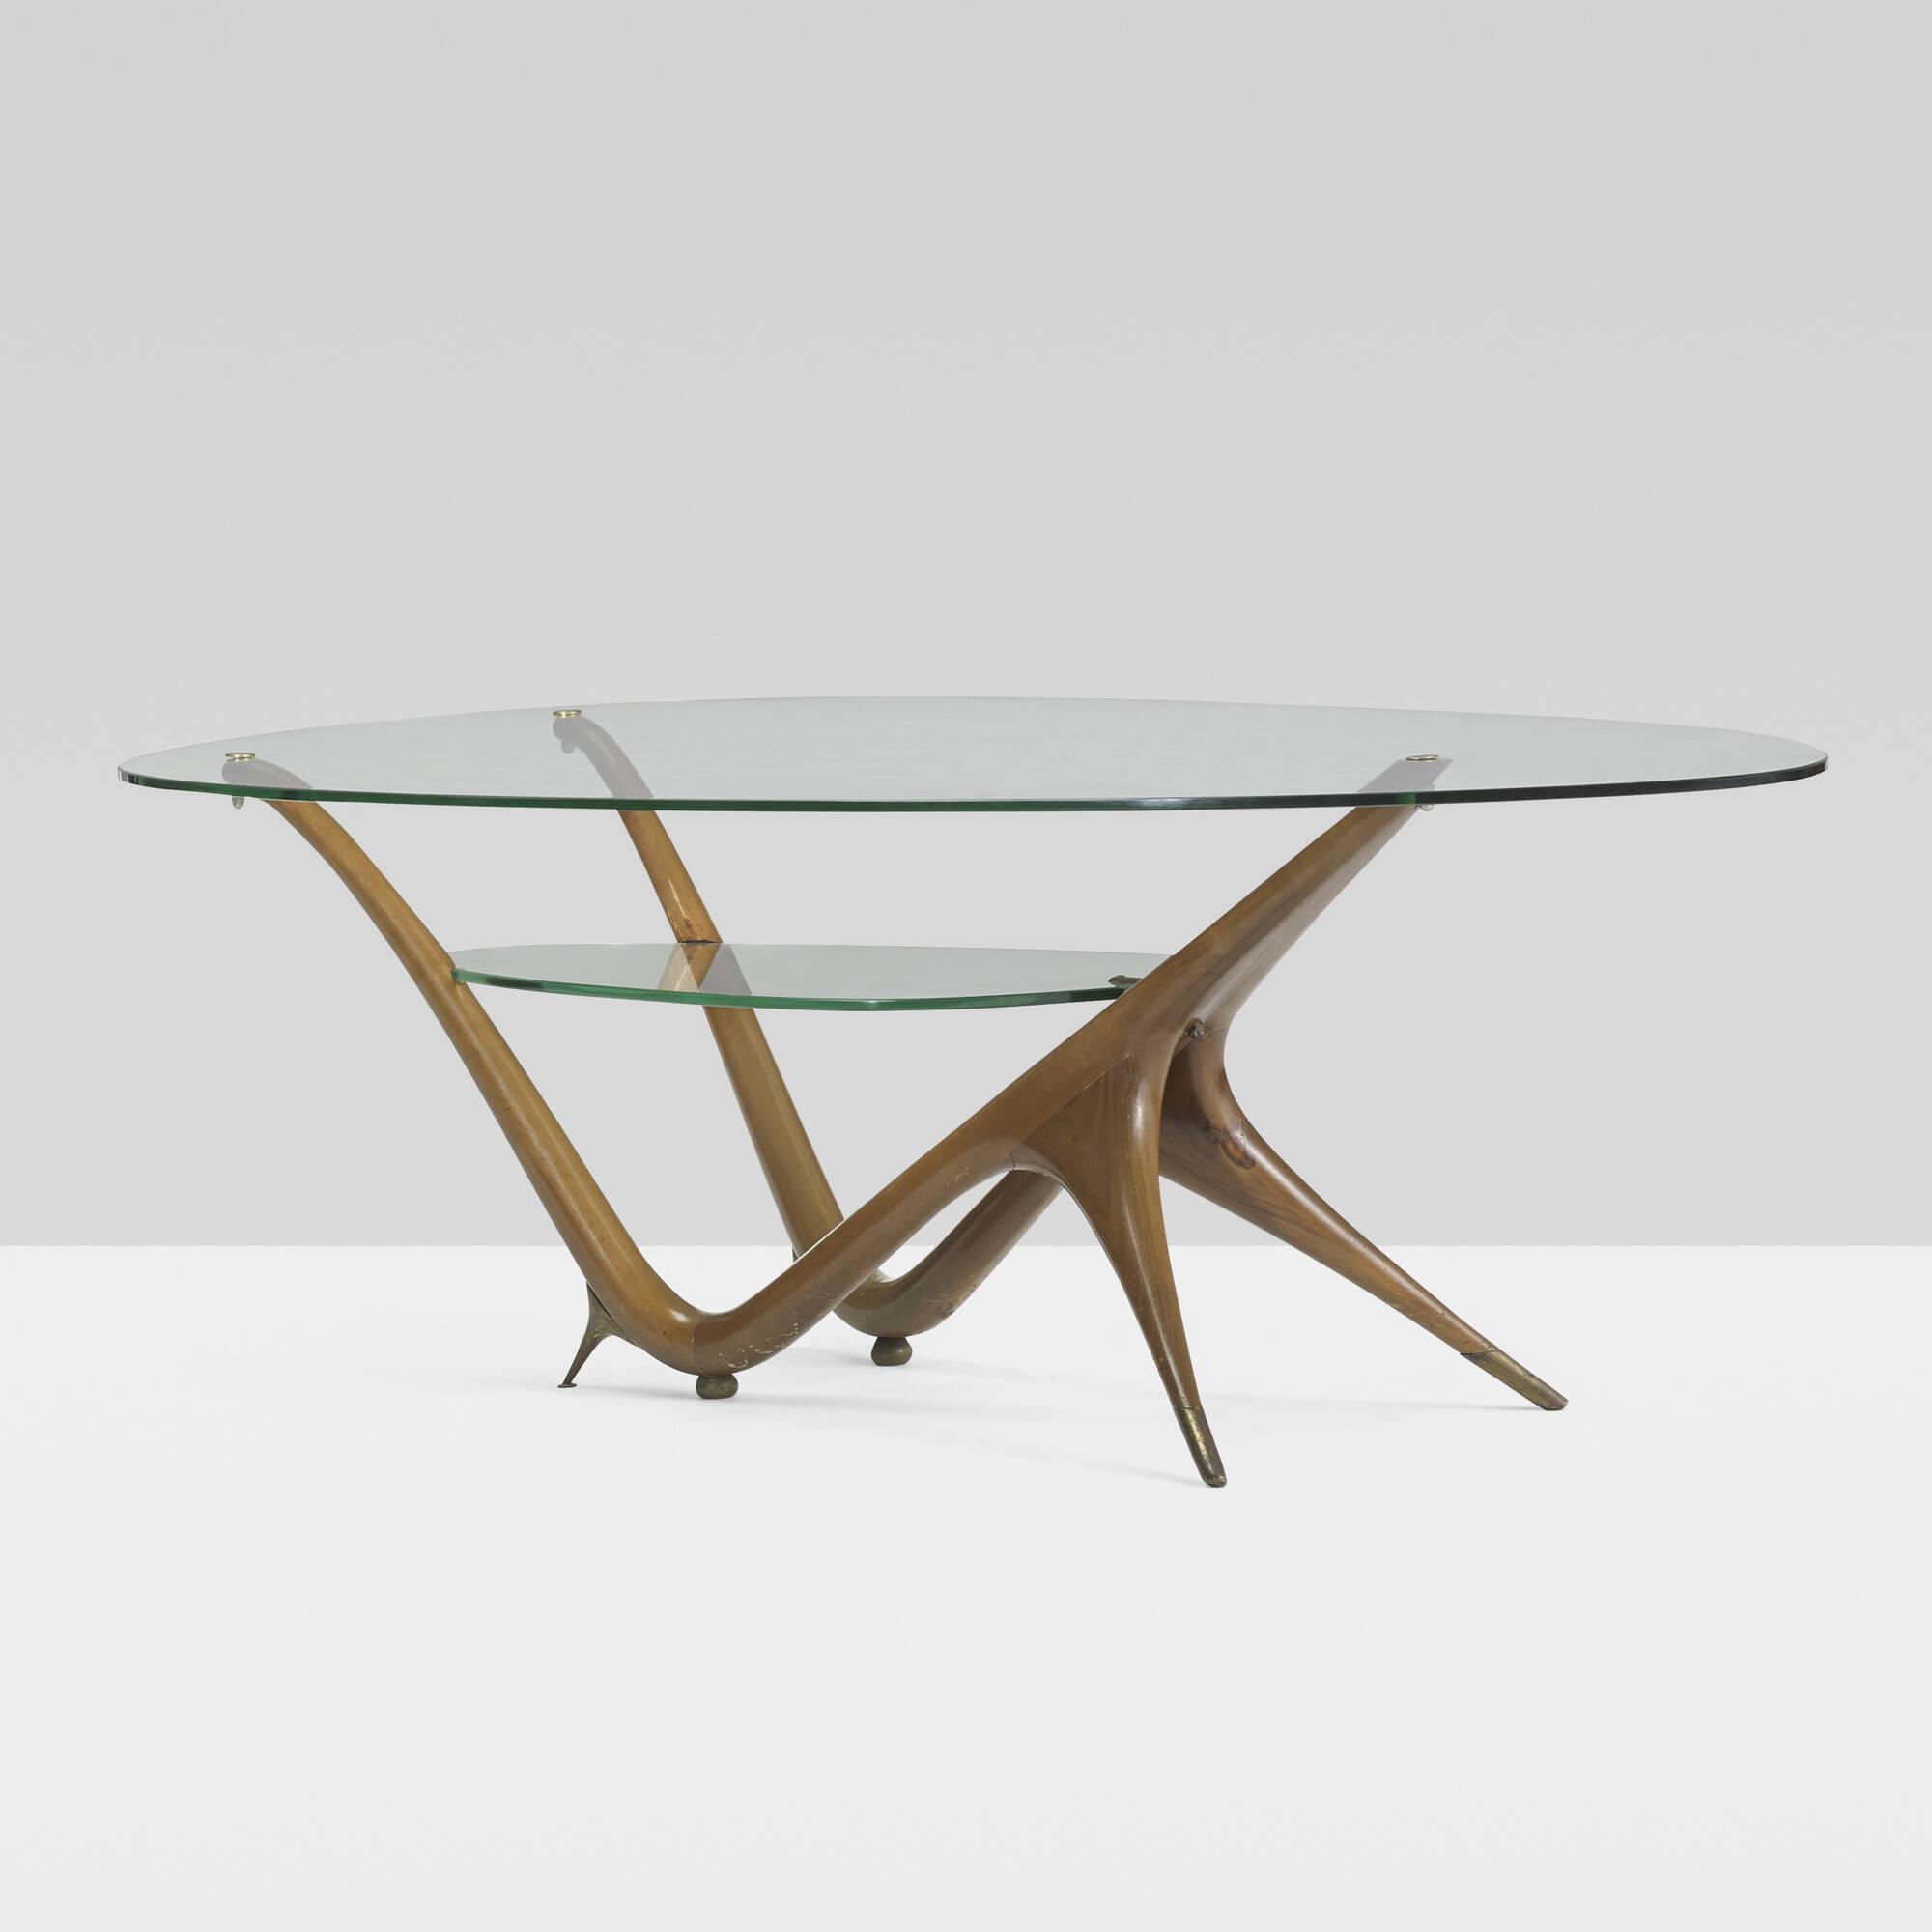 Sensational 198 Carlo Mollino Important Coffee Table Model 1114 Inzonedesignstudio Interior Chair Design Inzonedesignstudiocom